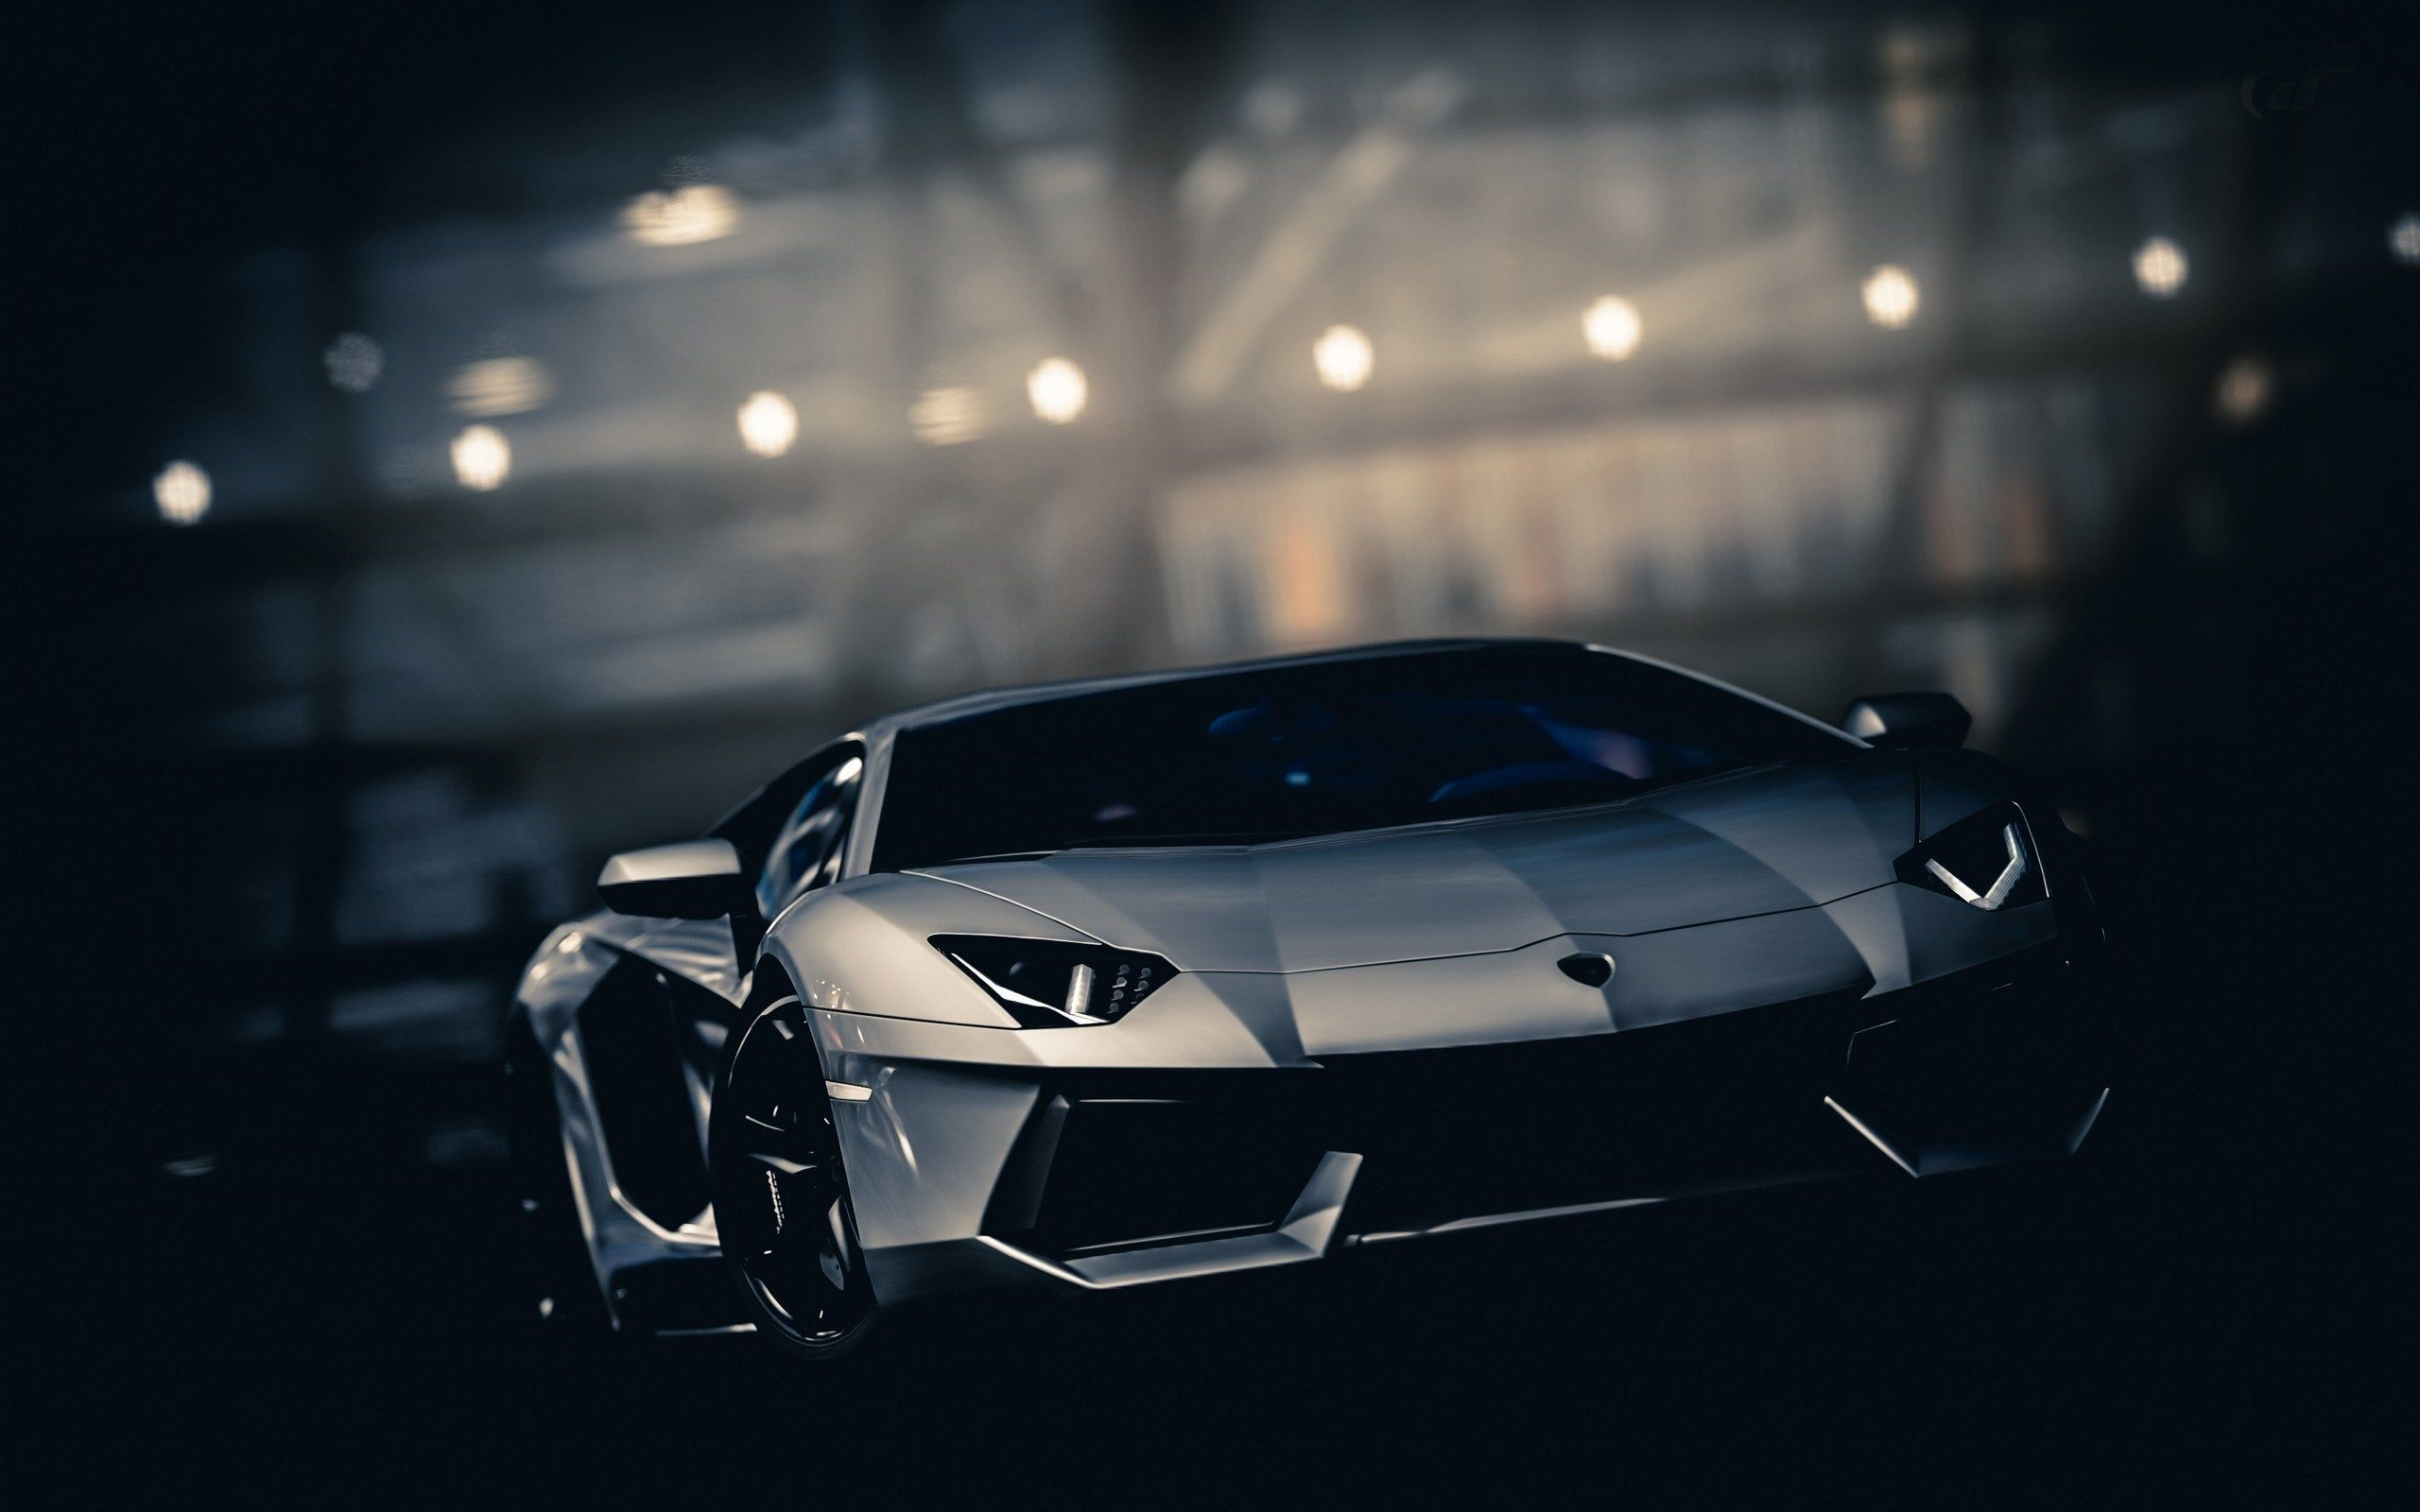 Lamborghini Aventador Wallpaper Hd Ololoshenka Pinterest